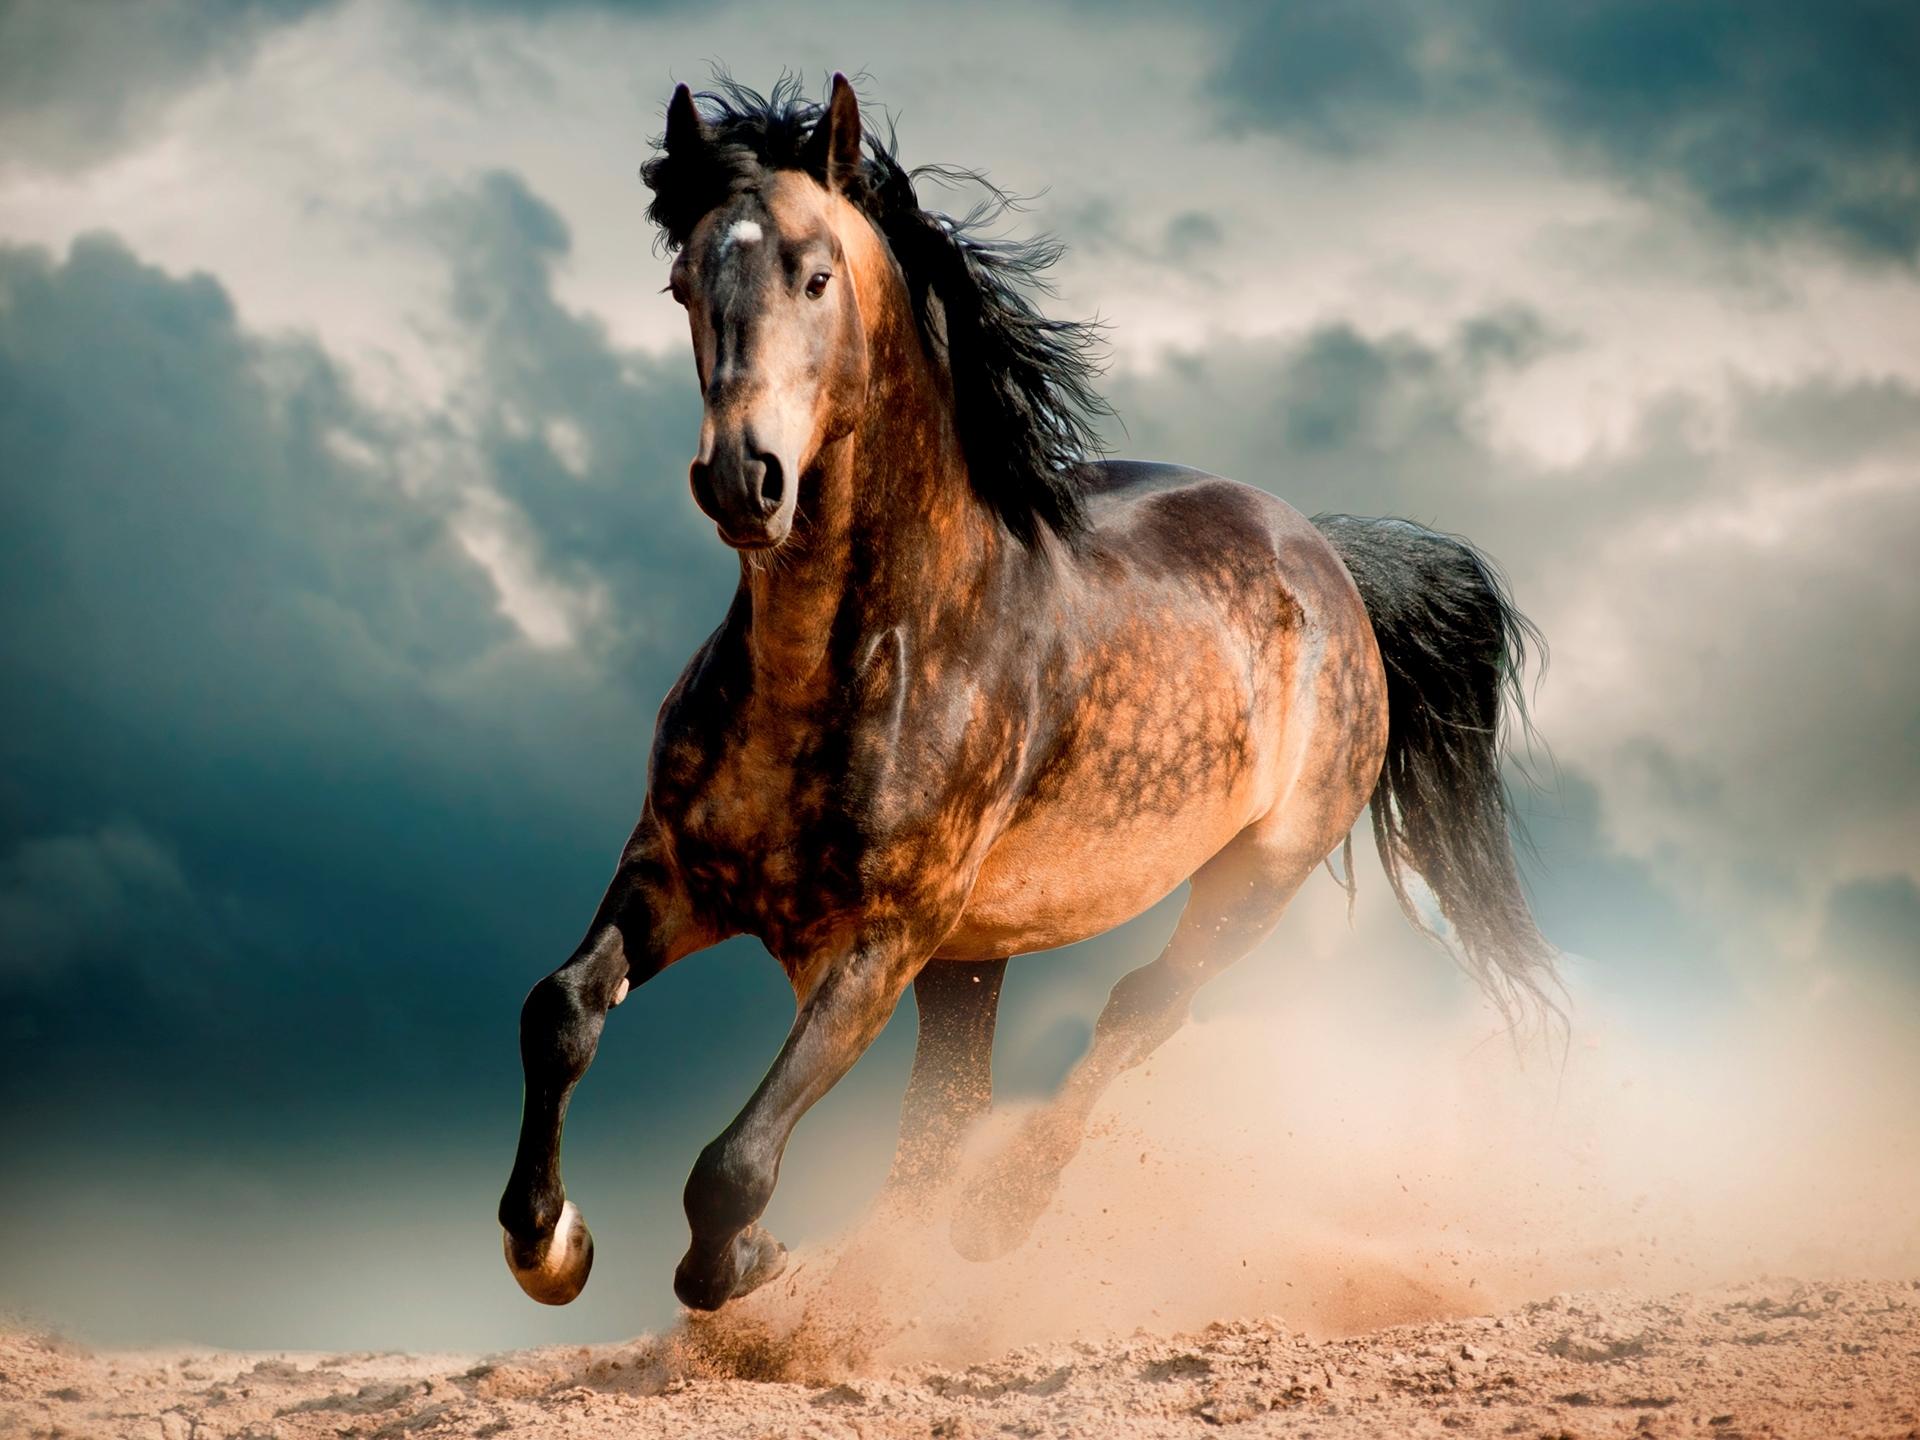 peinture chevaux wallpaper - photo #4